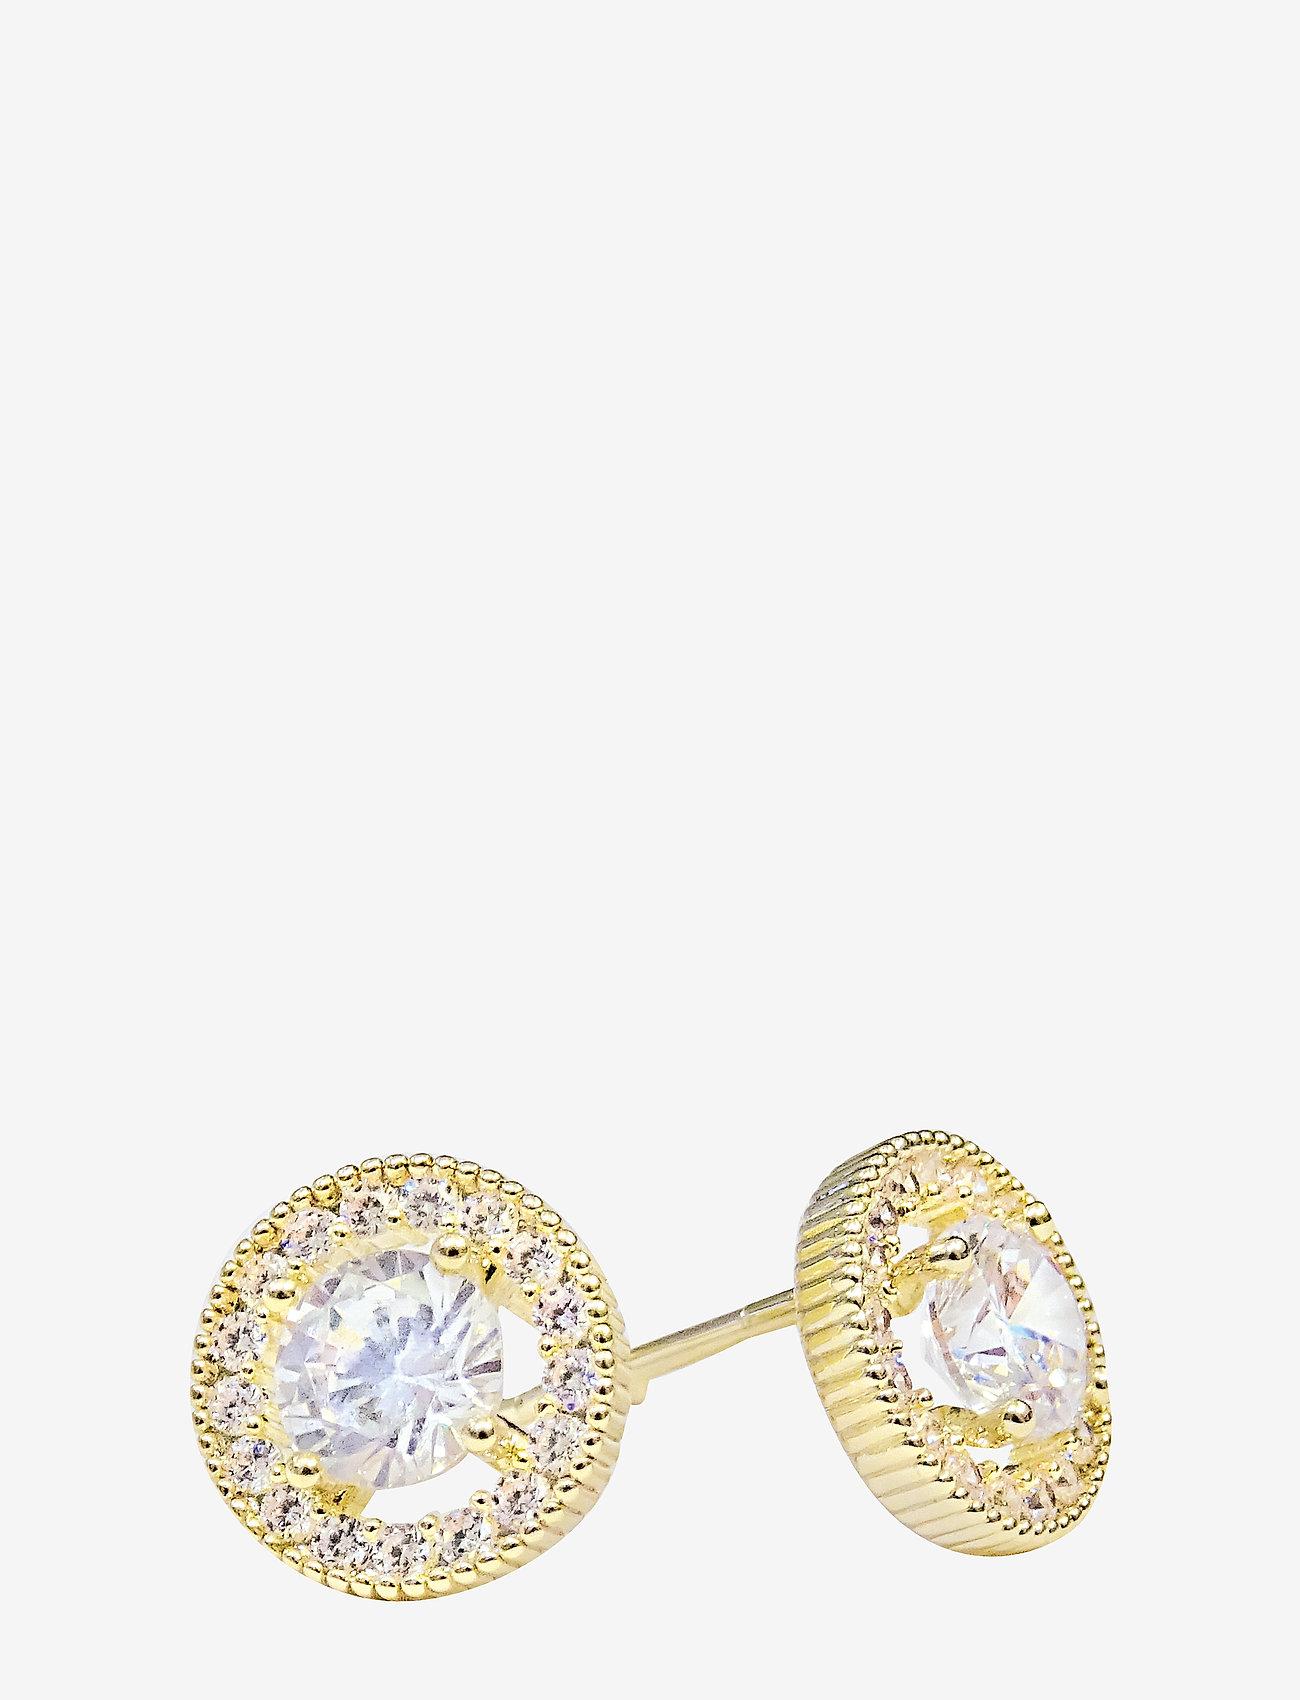 PIPOL'S BAZAAR - Estrade PIPOL Ear Golden Clear - statement - gold